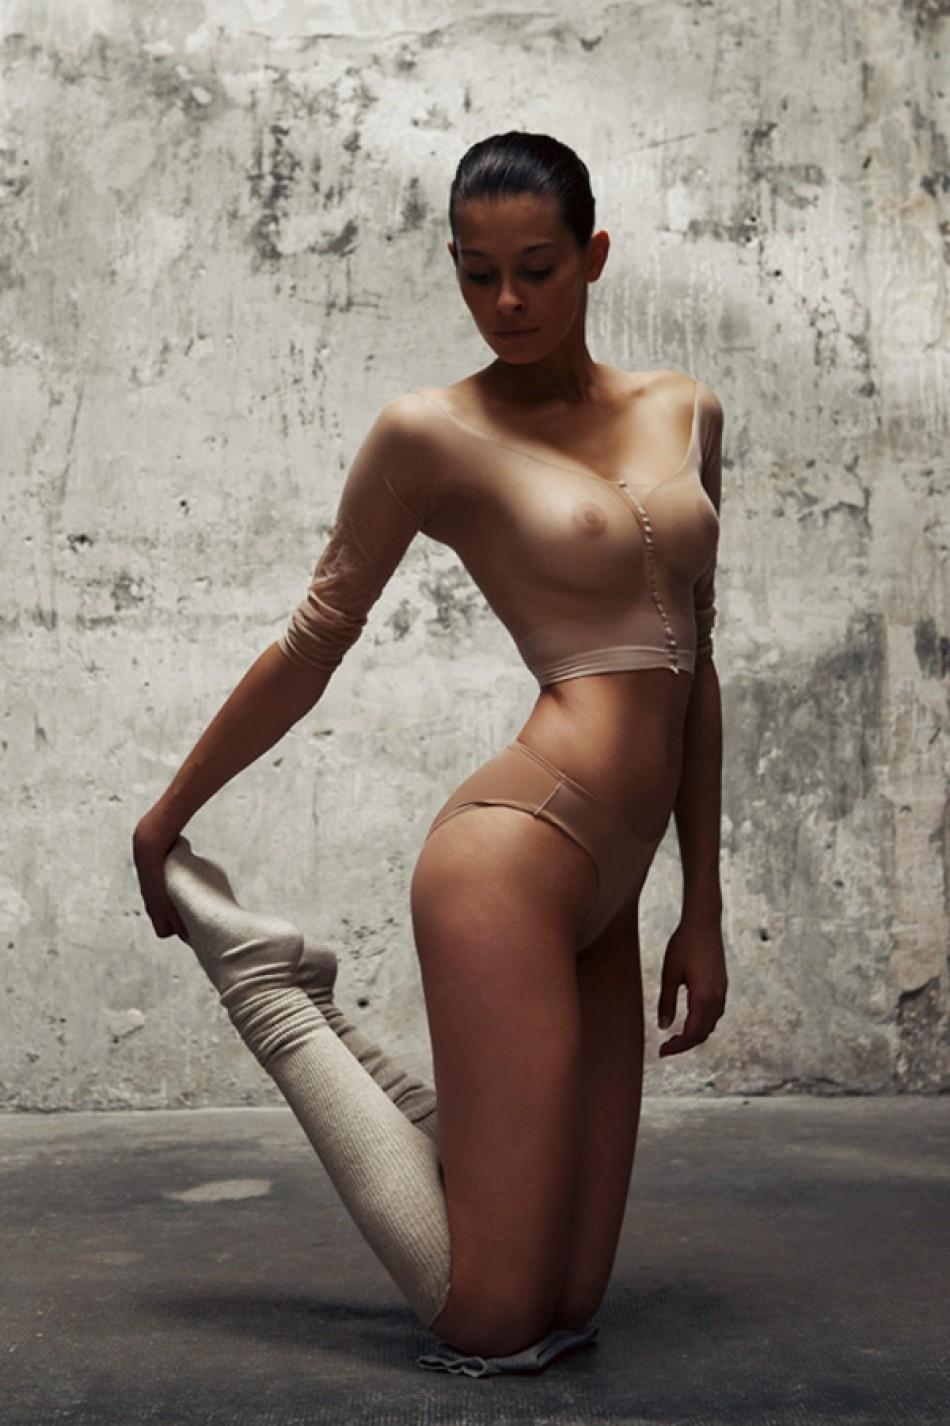 Erotica Lara Swiecicki nude (52 photo), Tits, Cleavage, Feet, panties 2015